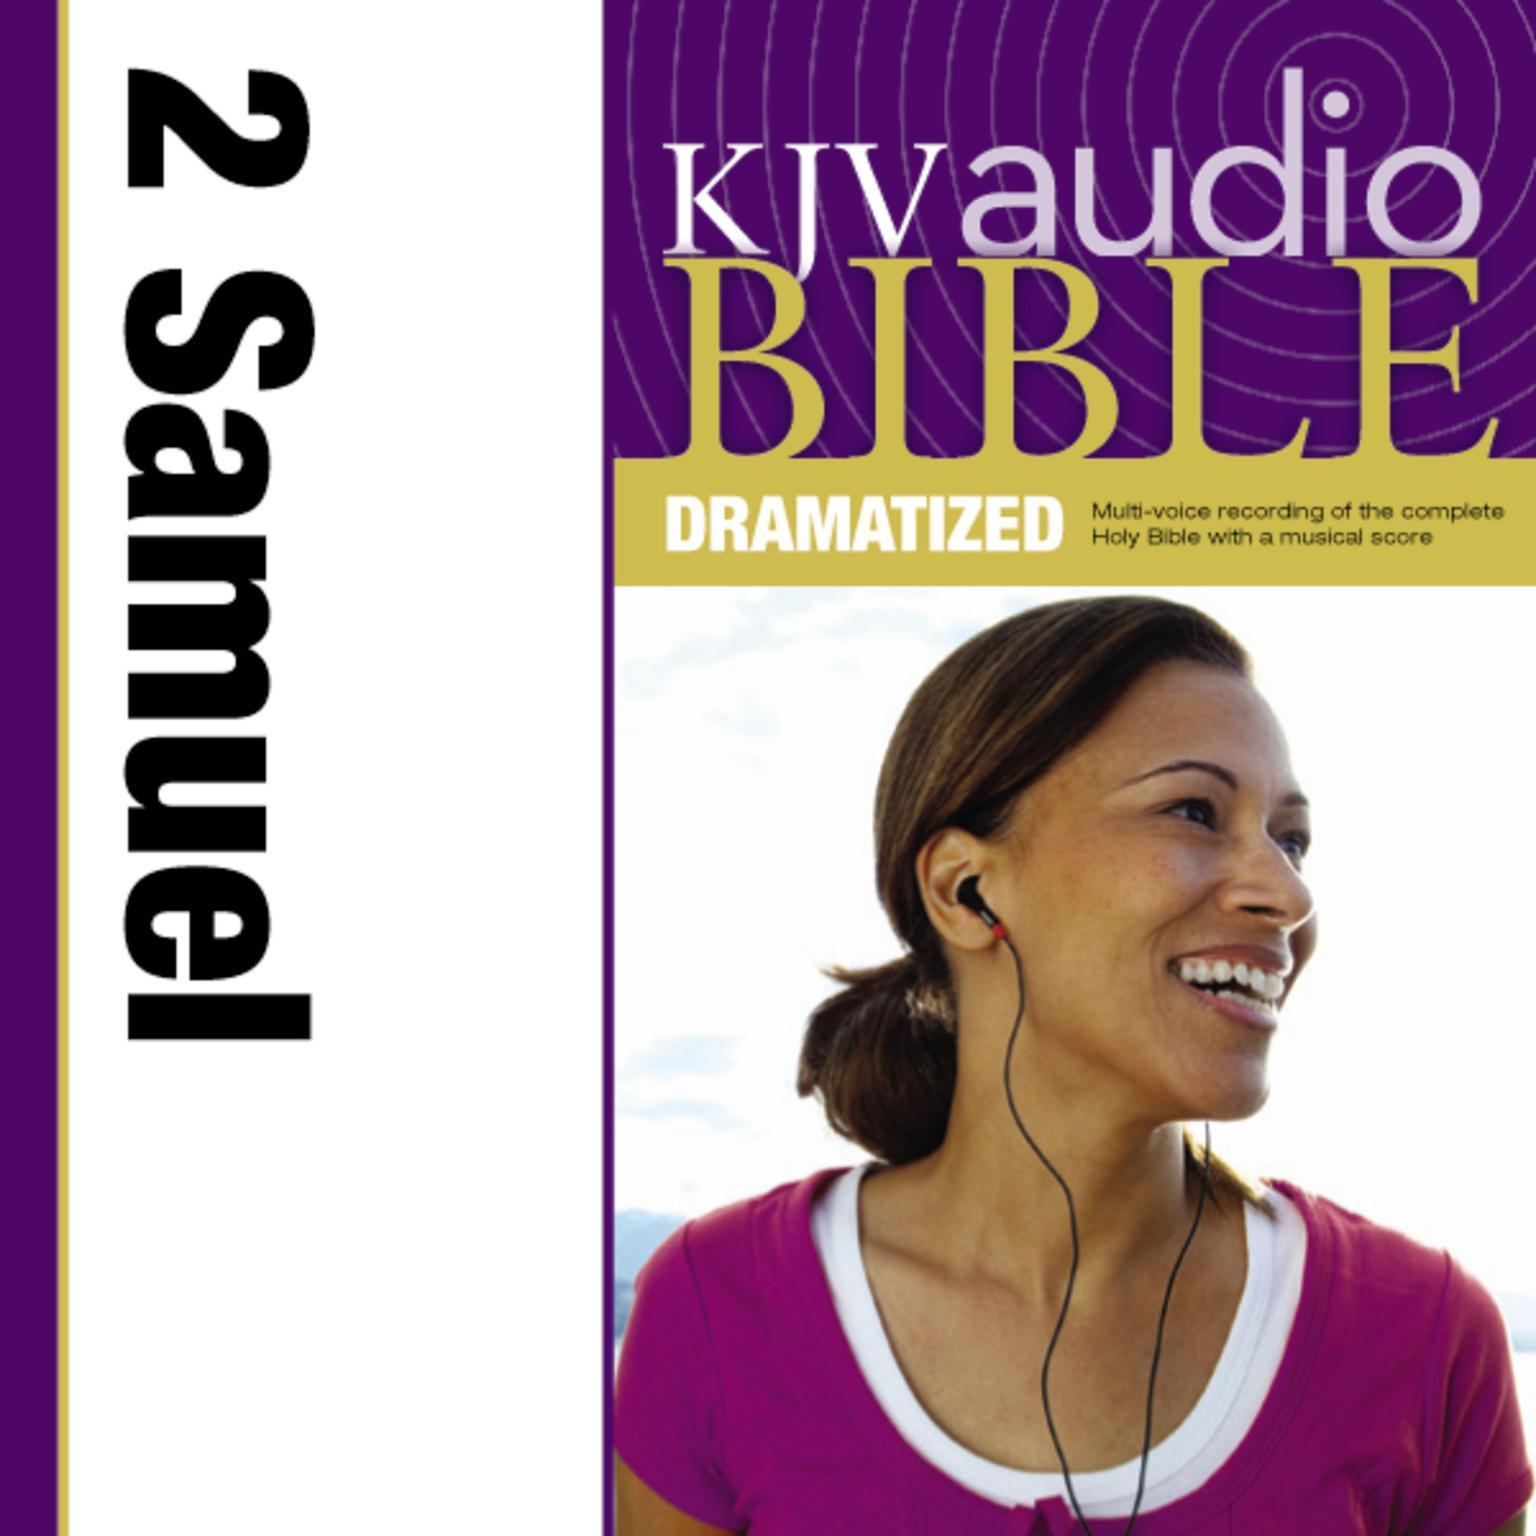 Printable KJV, Audio Bible, Dramatized: 2 Samuel, Audio Download Audiobook Cover Art